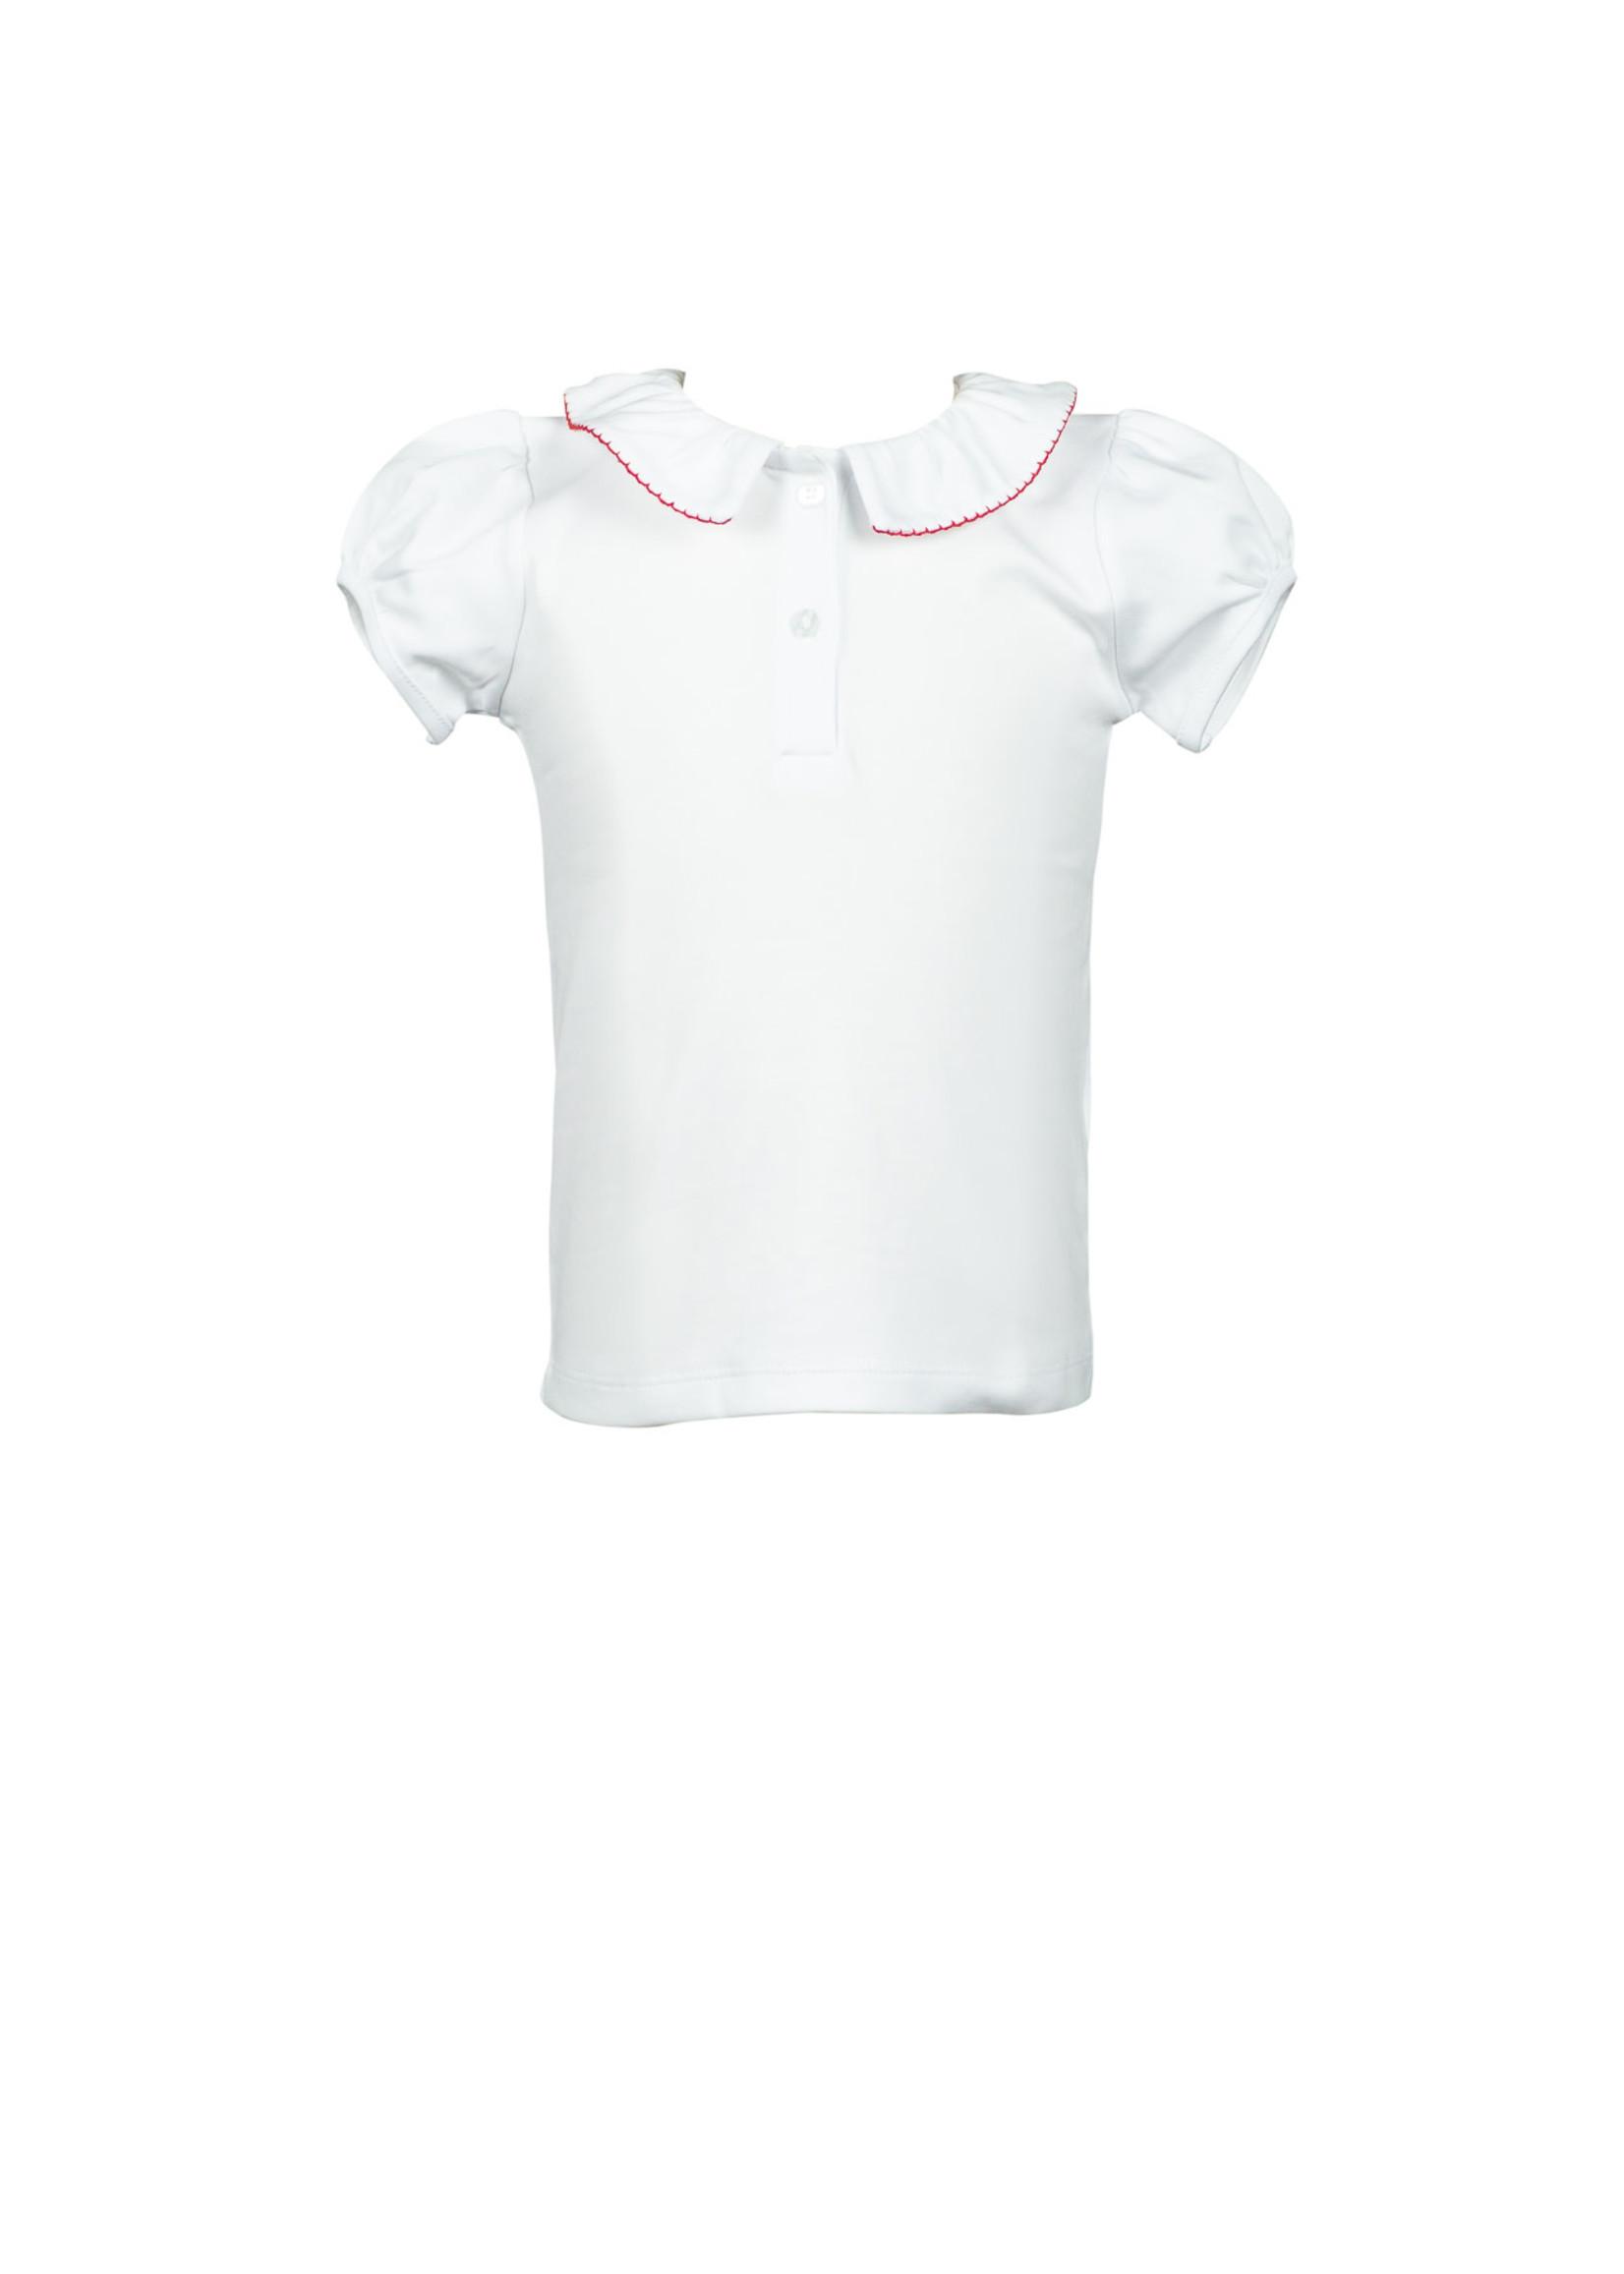 Proper Peony Apple White/Red  Shirt